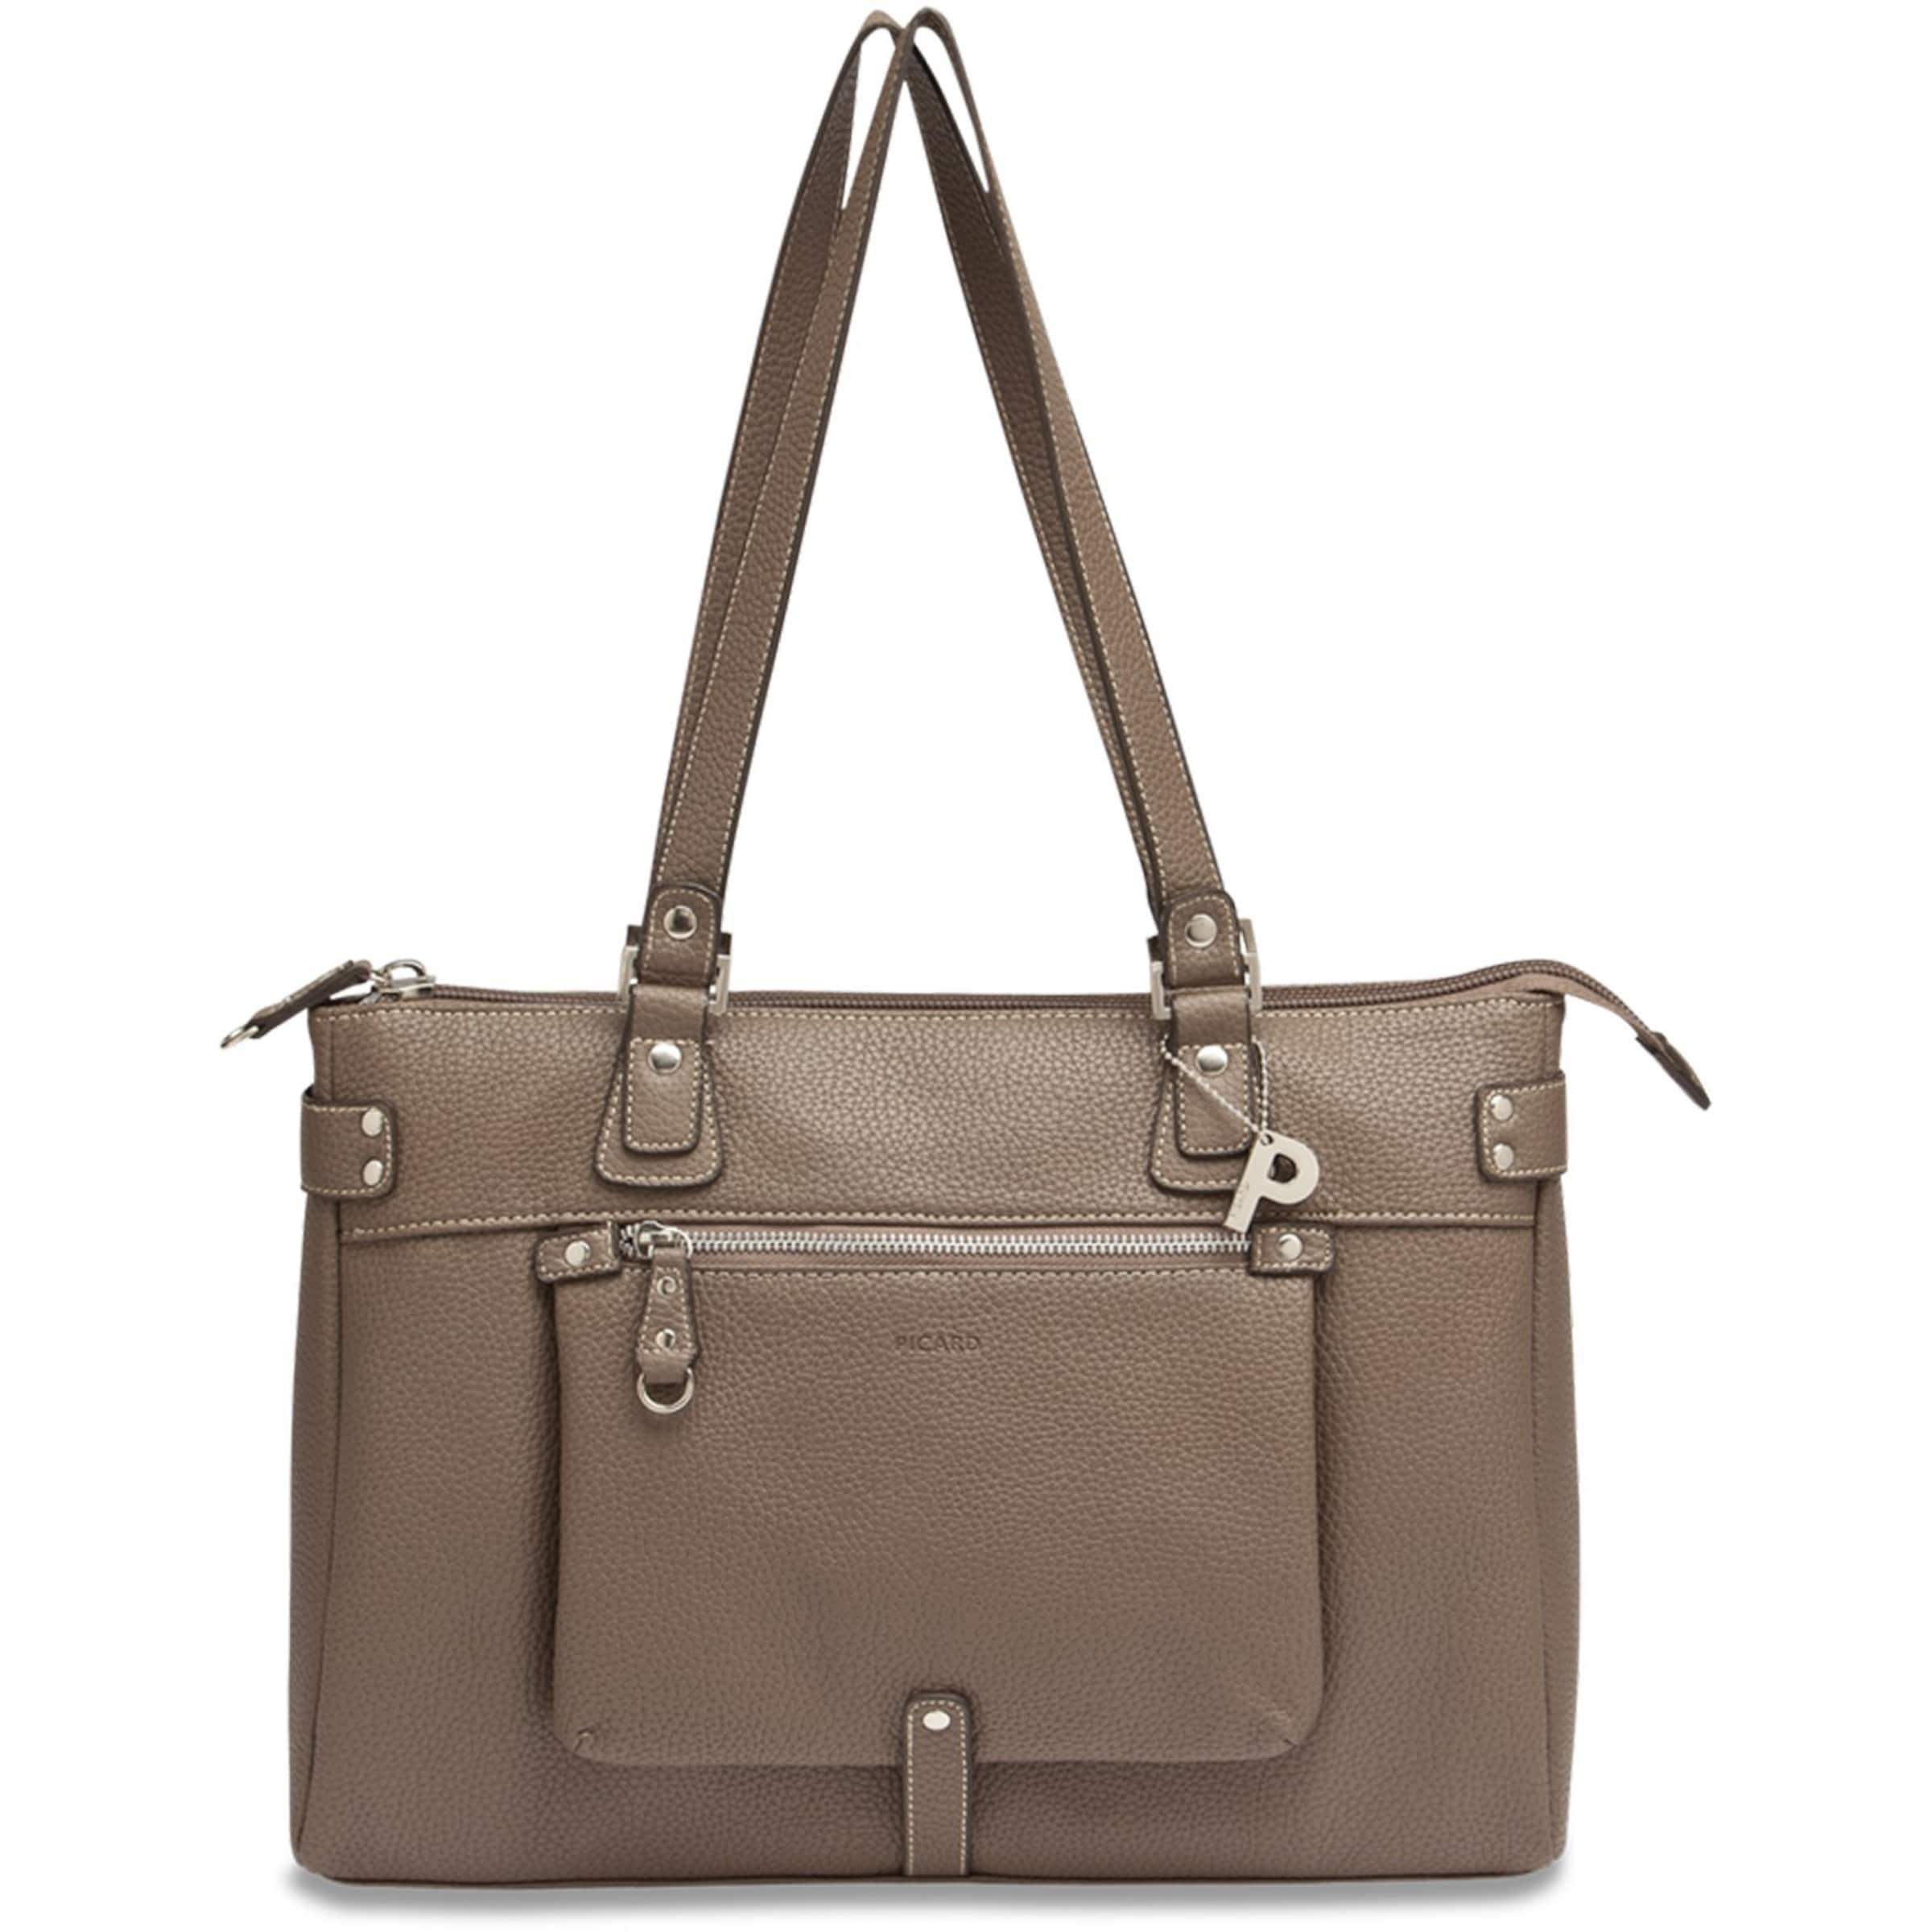 Loire Mokka Shopper Tasche 37 Picard Cm In A54jLq3R